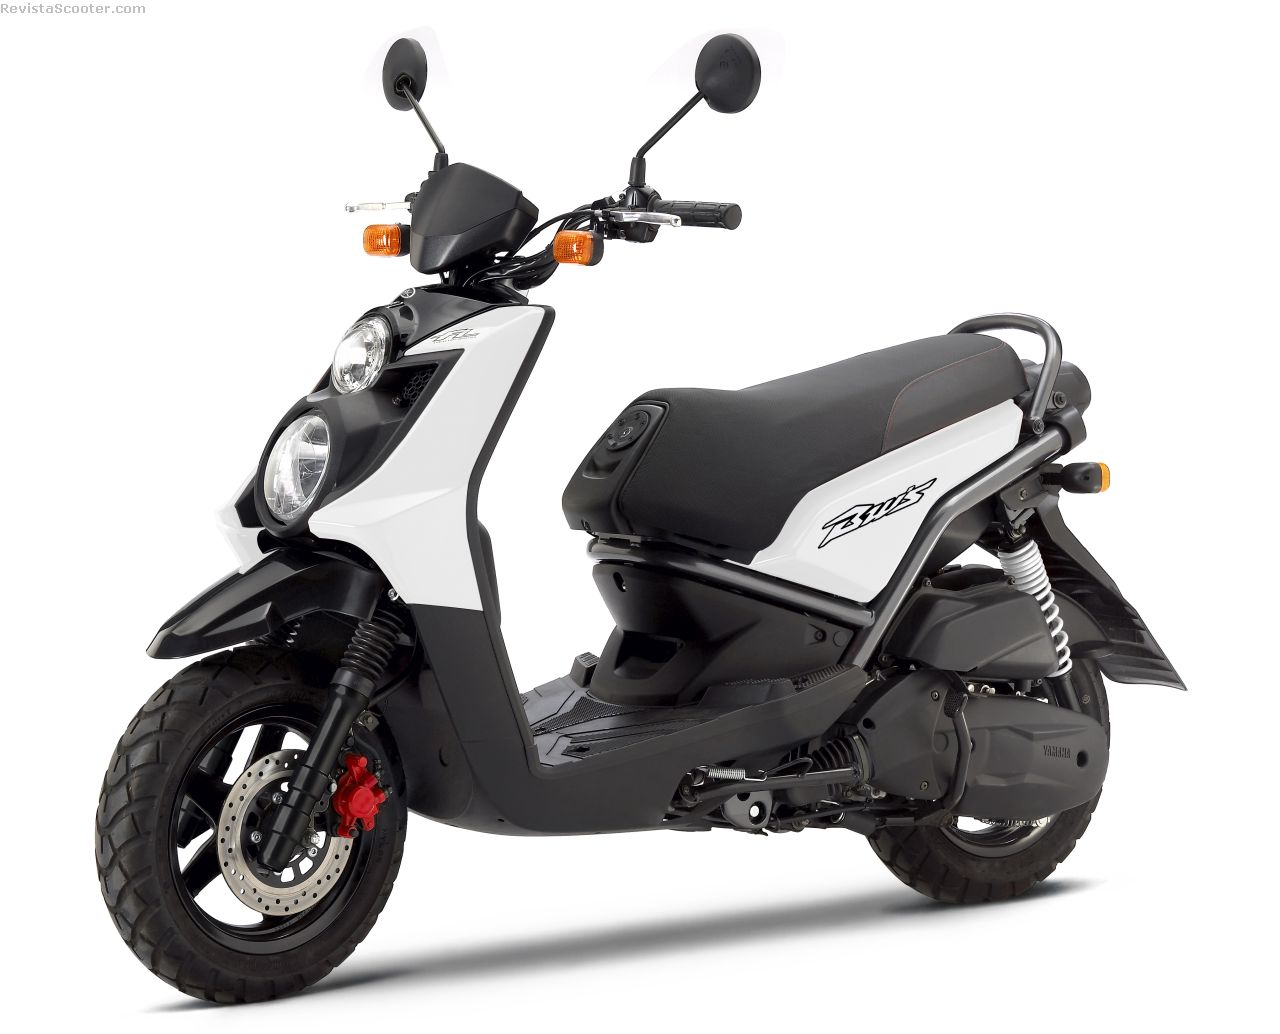 revista scooter nueva yamaha bw 39 s 2013 de 125cc. Black Bedroom Furniture Sets. Home Design Ideas